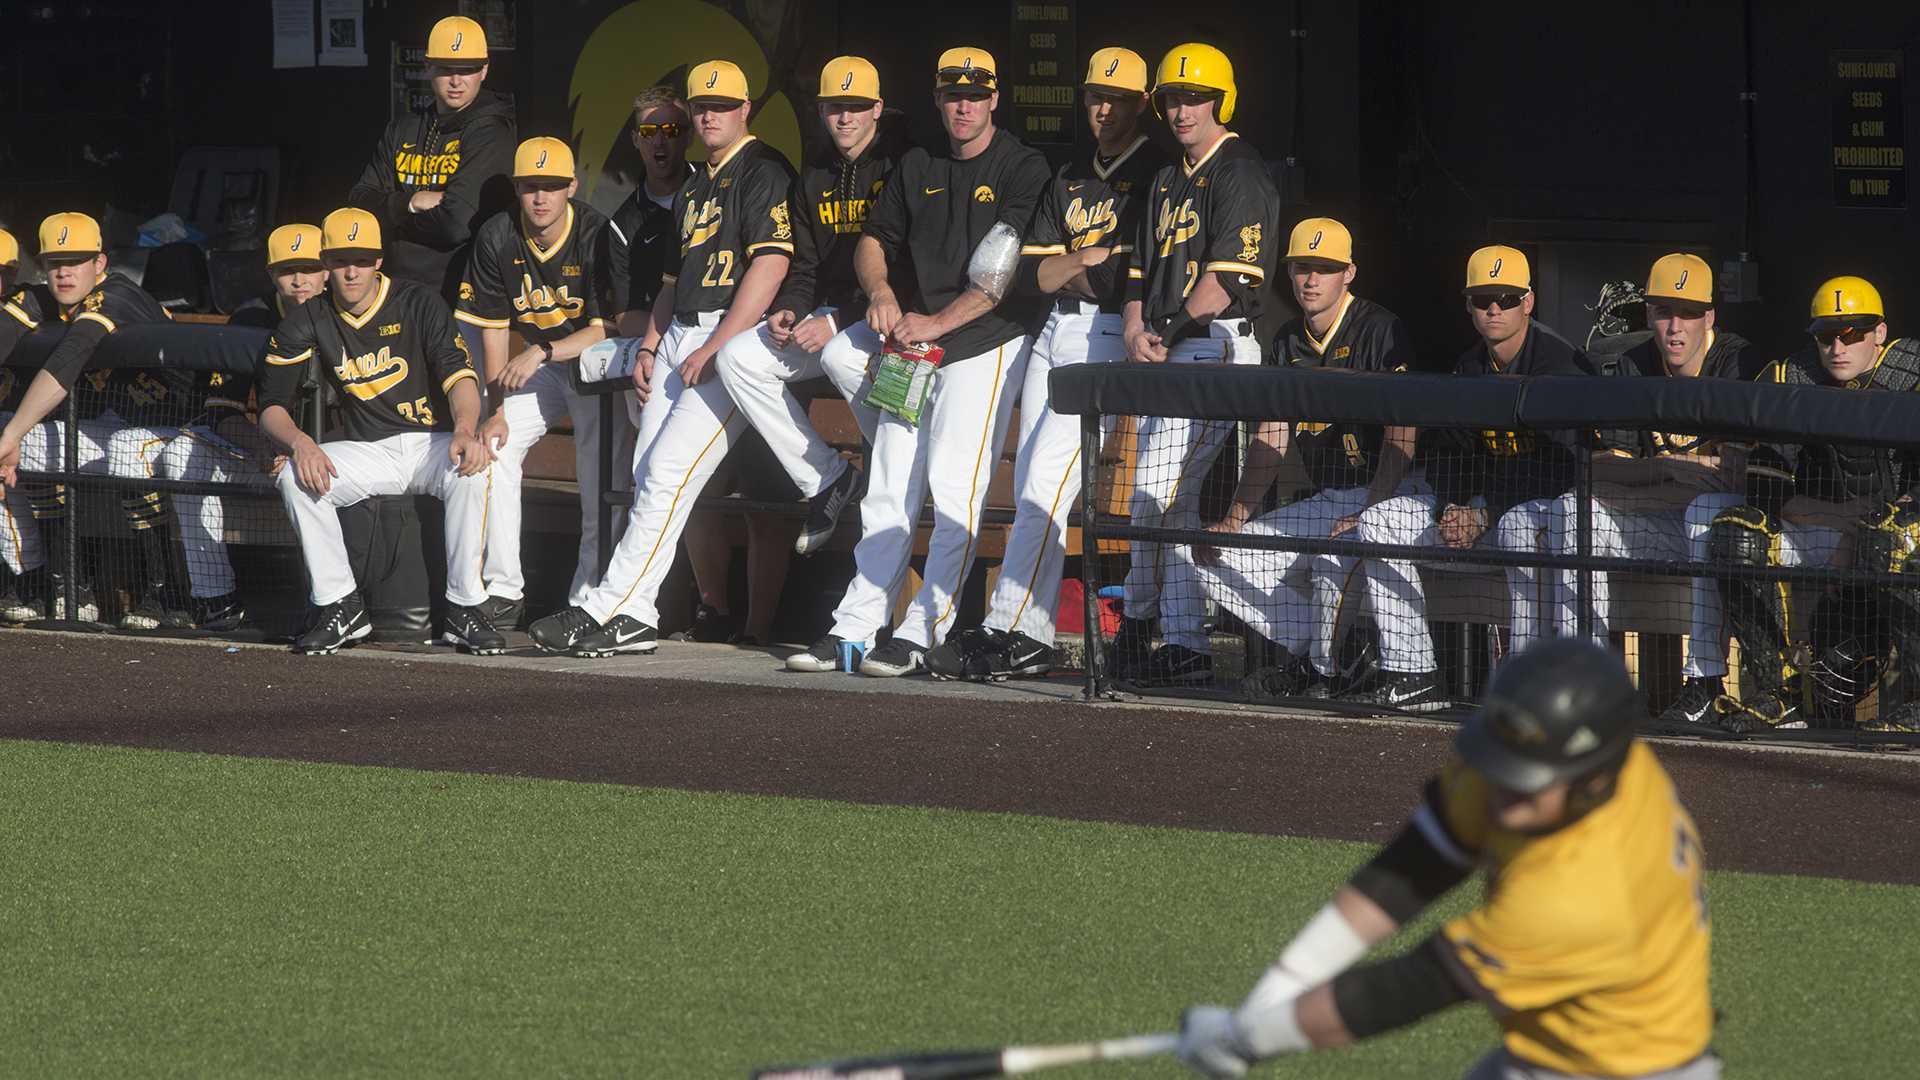 Iowa's bats show off in win over Milwaukee